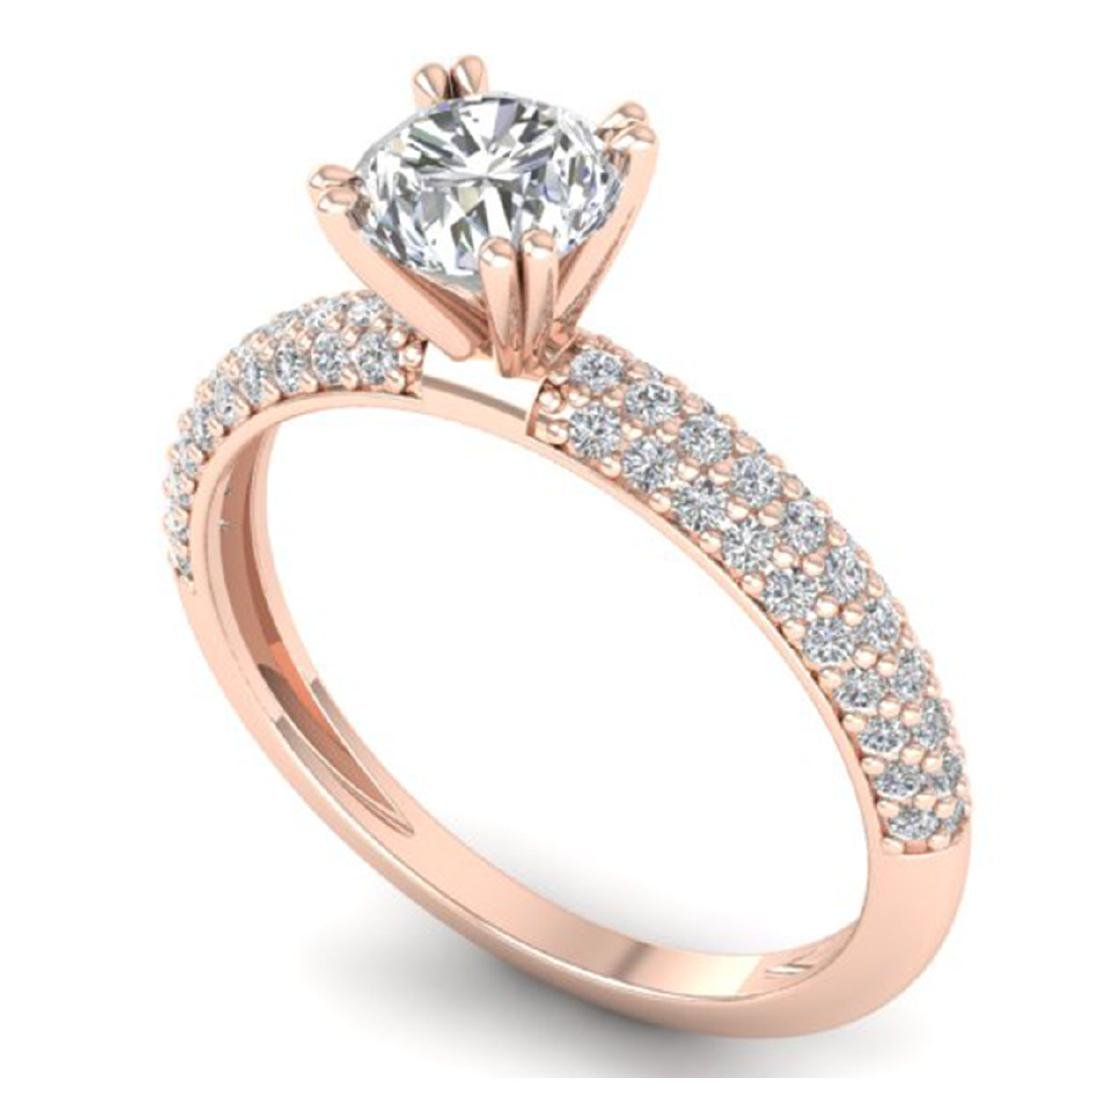 1.4 CTW Certified VS/SI Diamond Solitaire Art Deco - 2